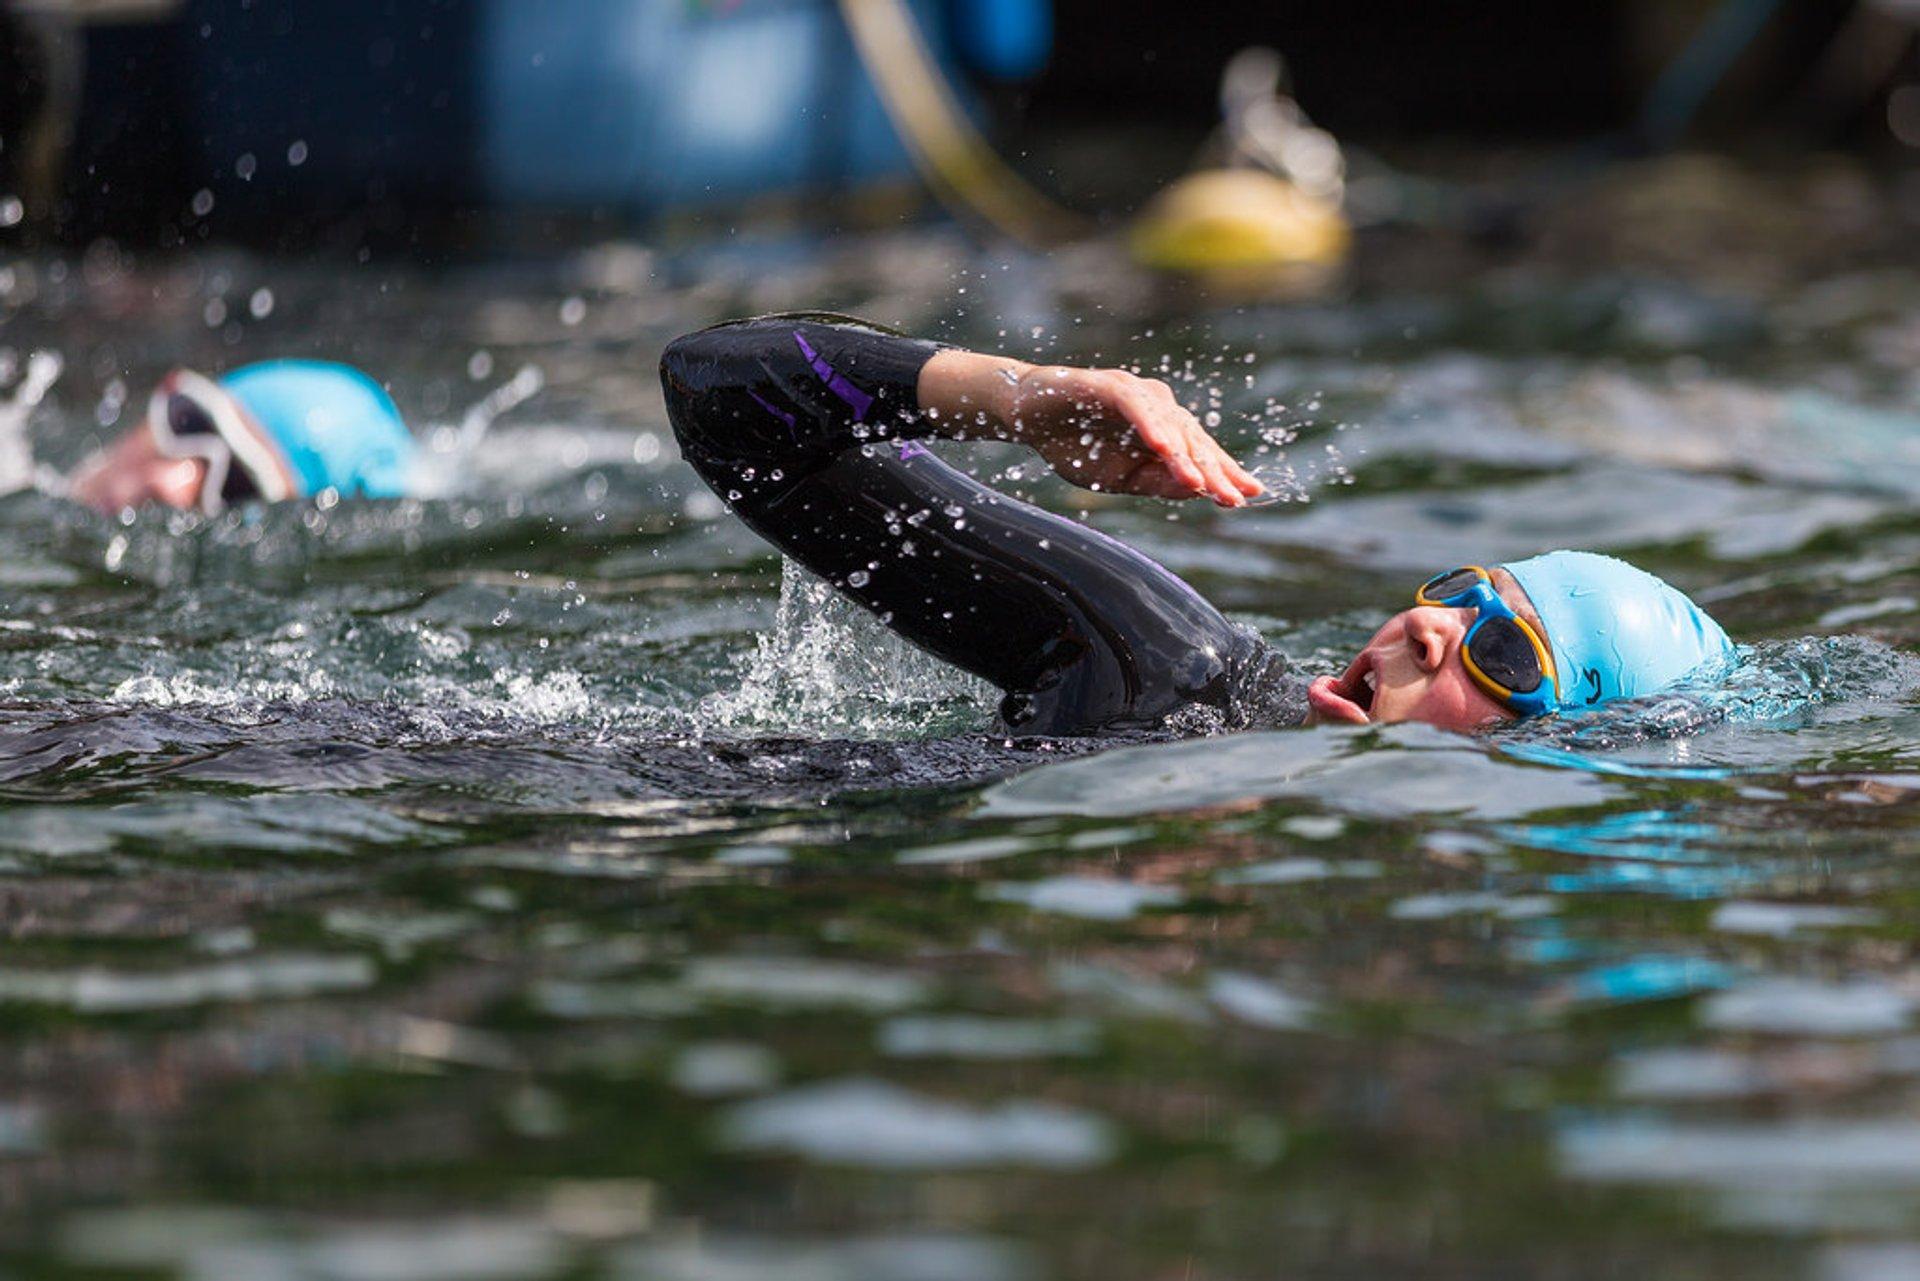 TrygFonden Christiansborg Rundt Copenhagen Swim in Copenhagen 2020 - Best Time